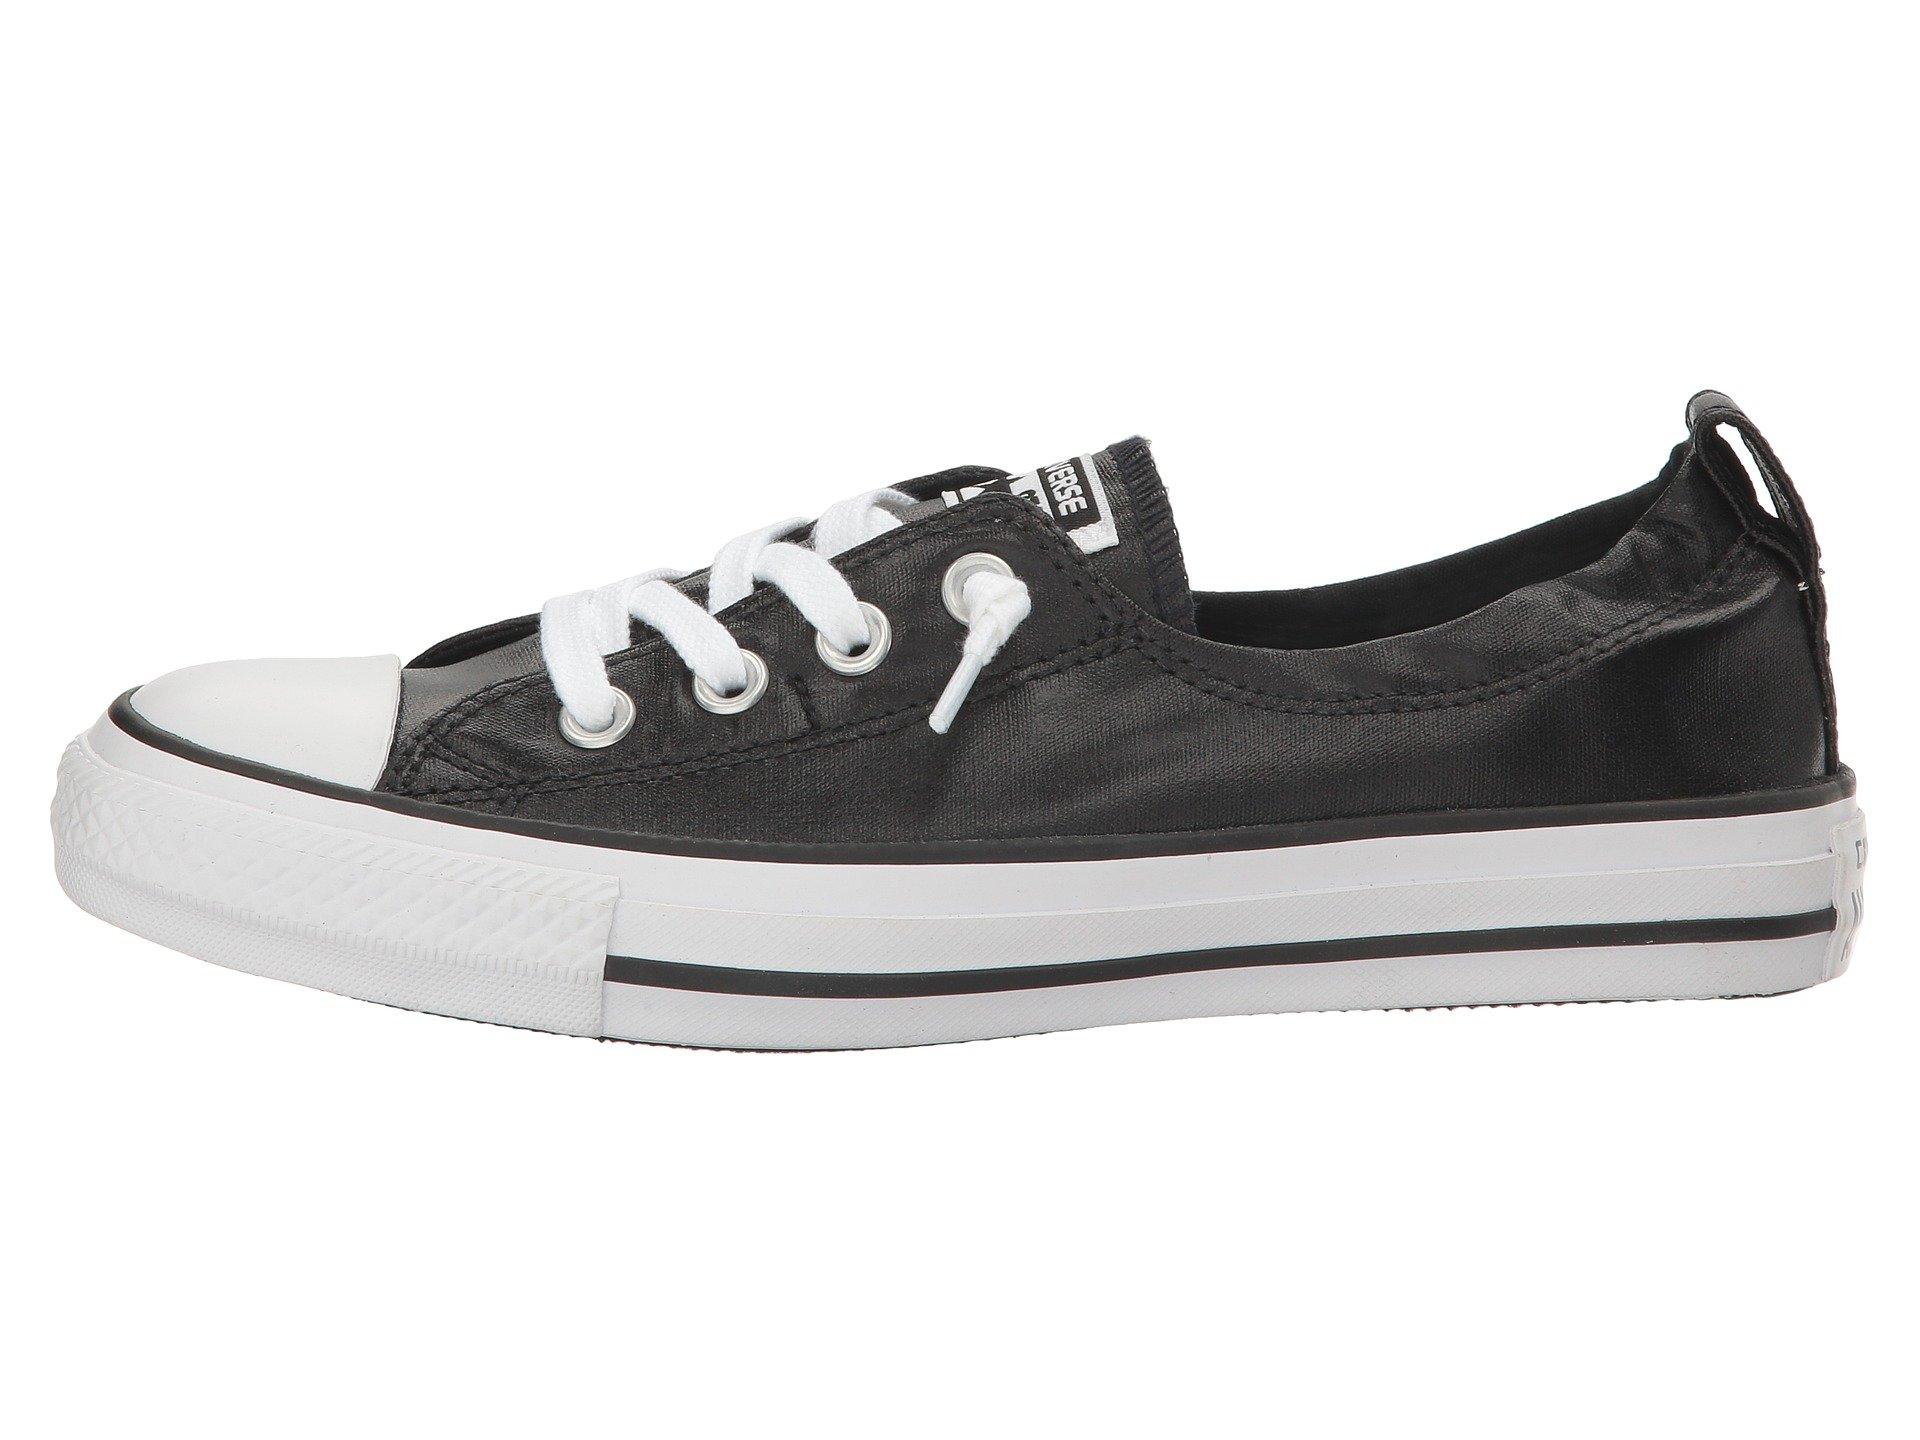 Metallic Converse Running Shoes Amazon